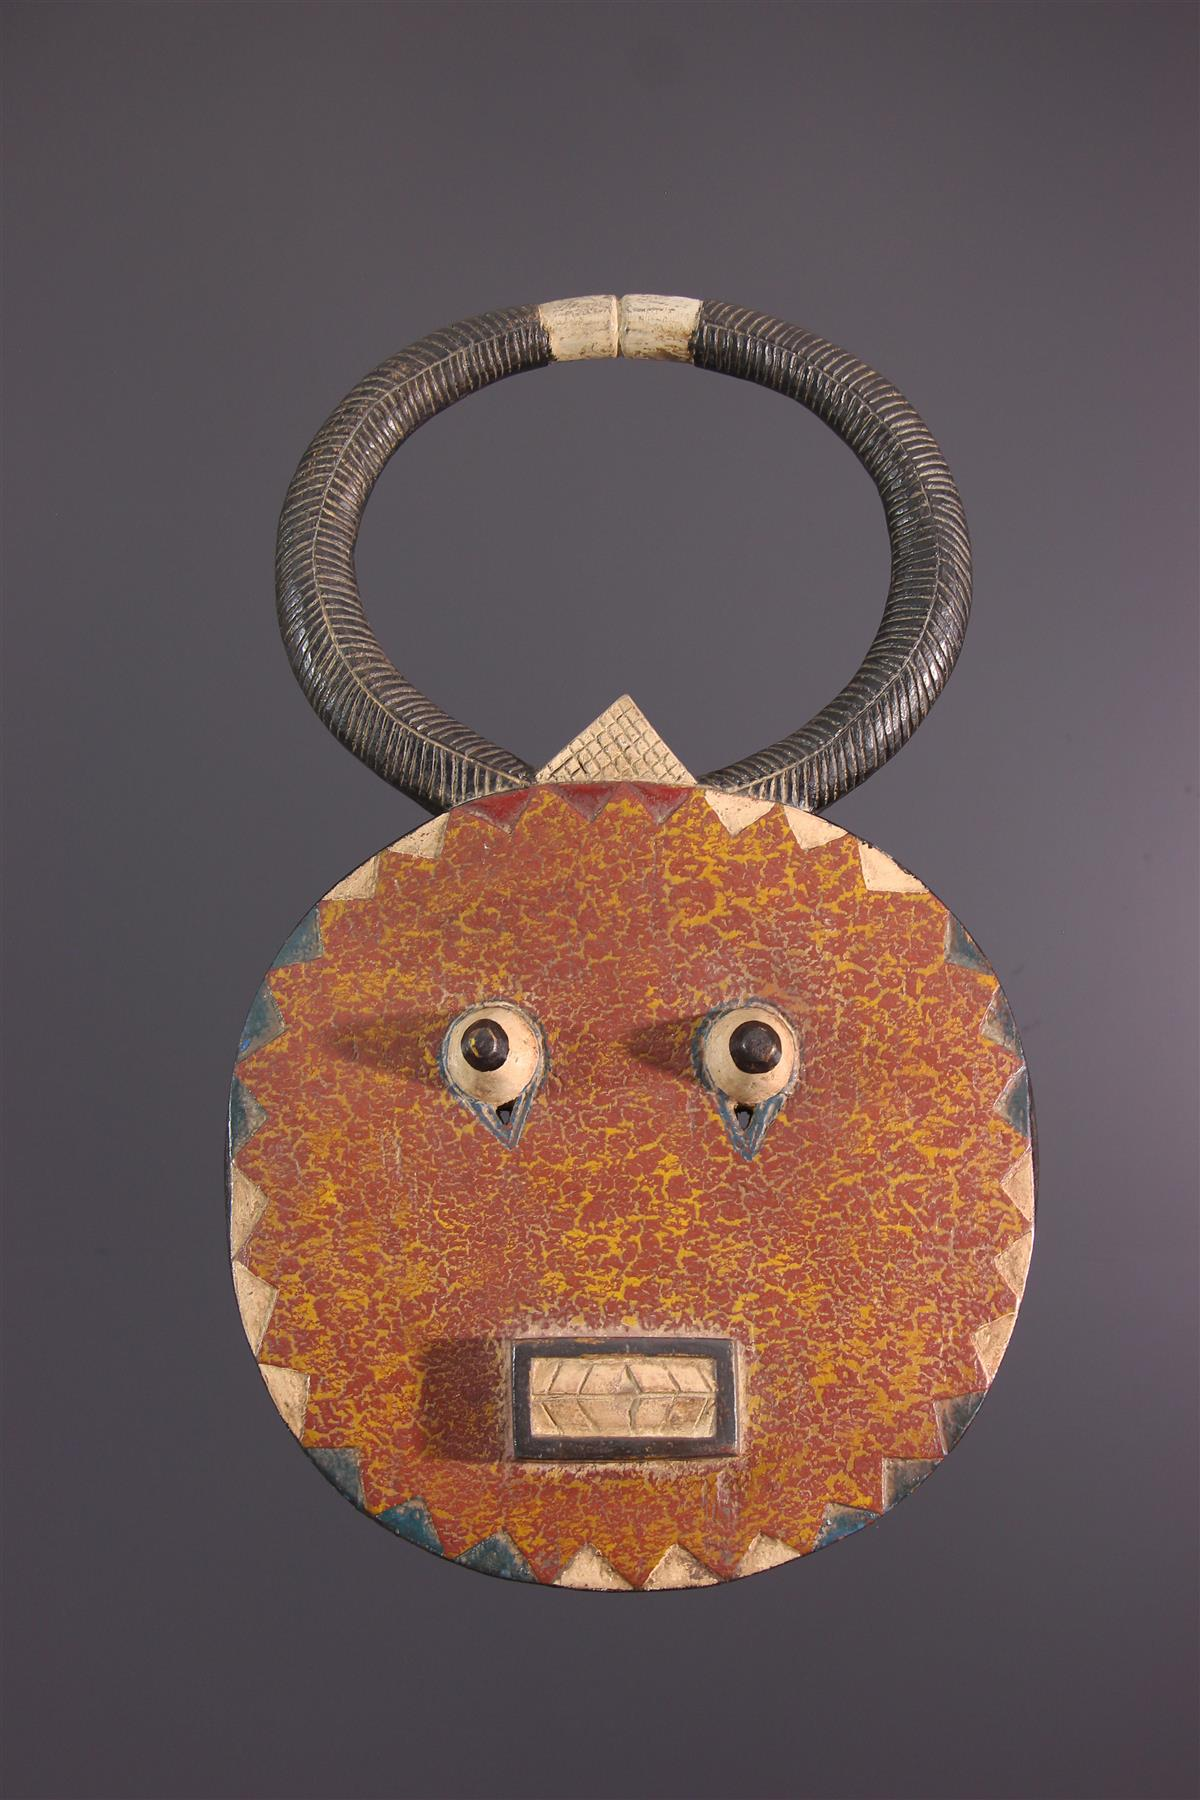 Kplé-kplé Mask - African art